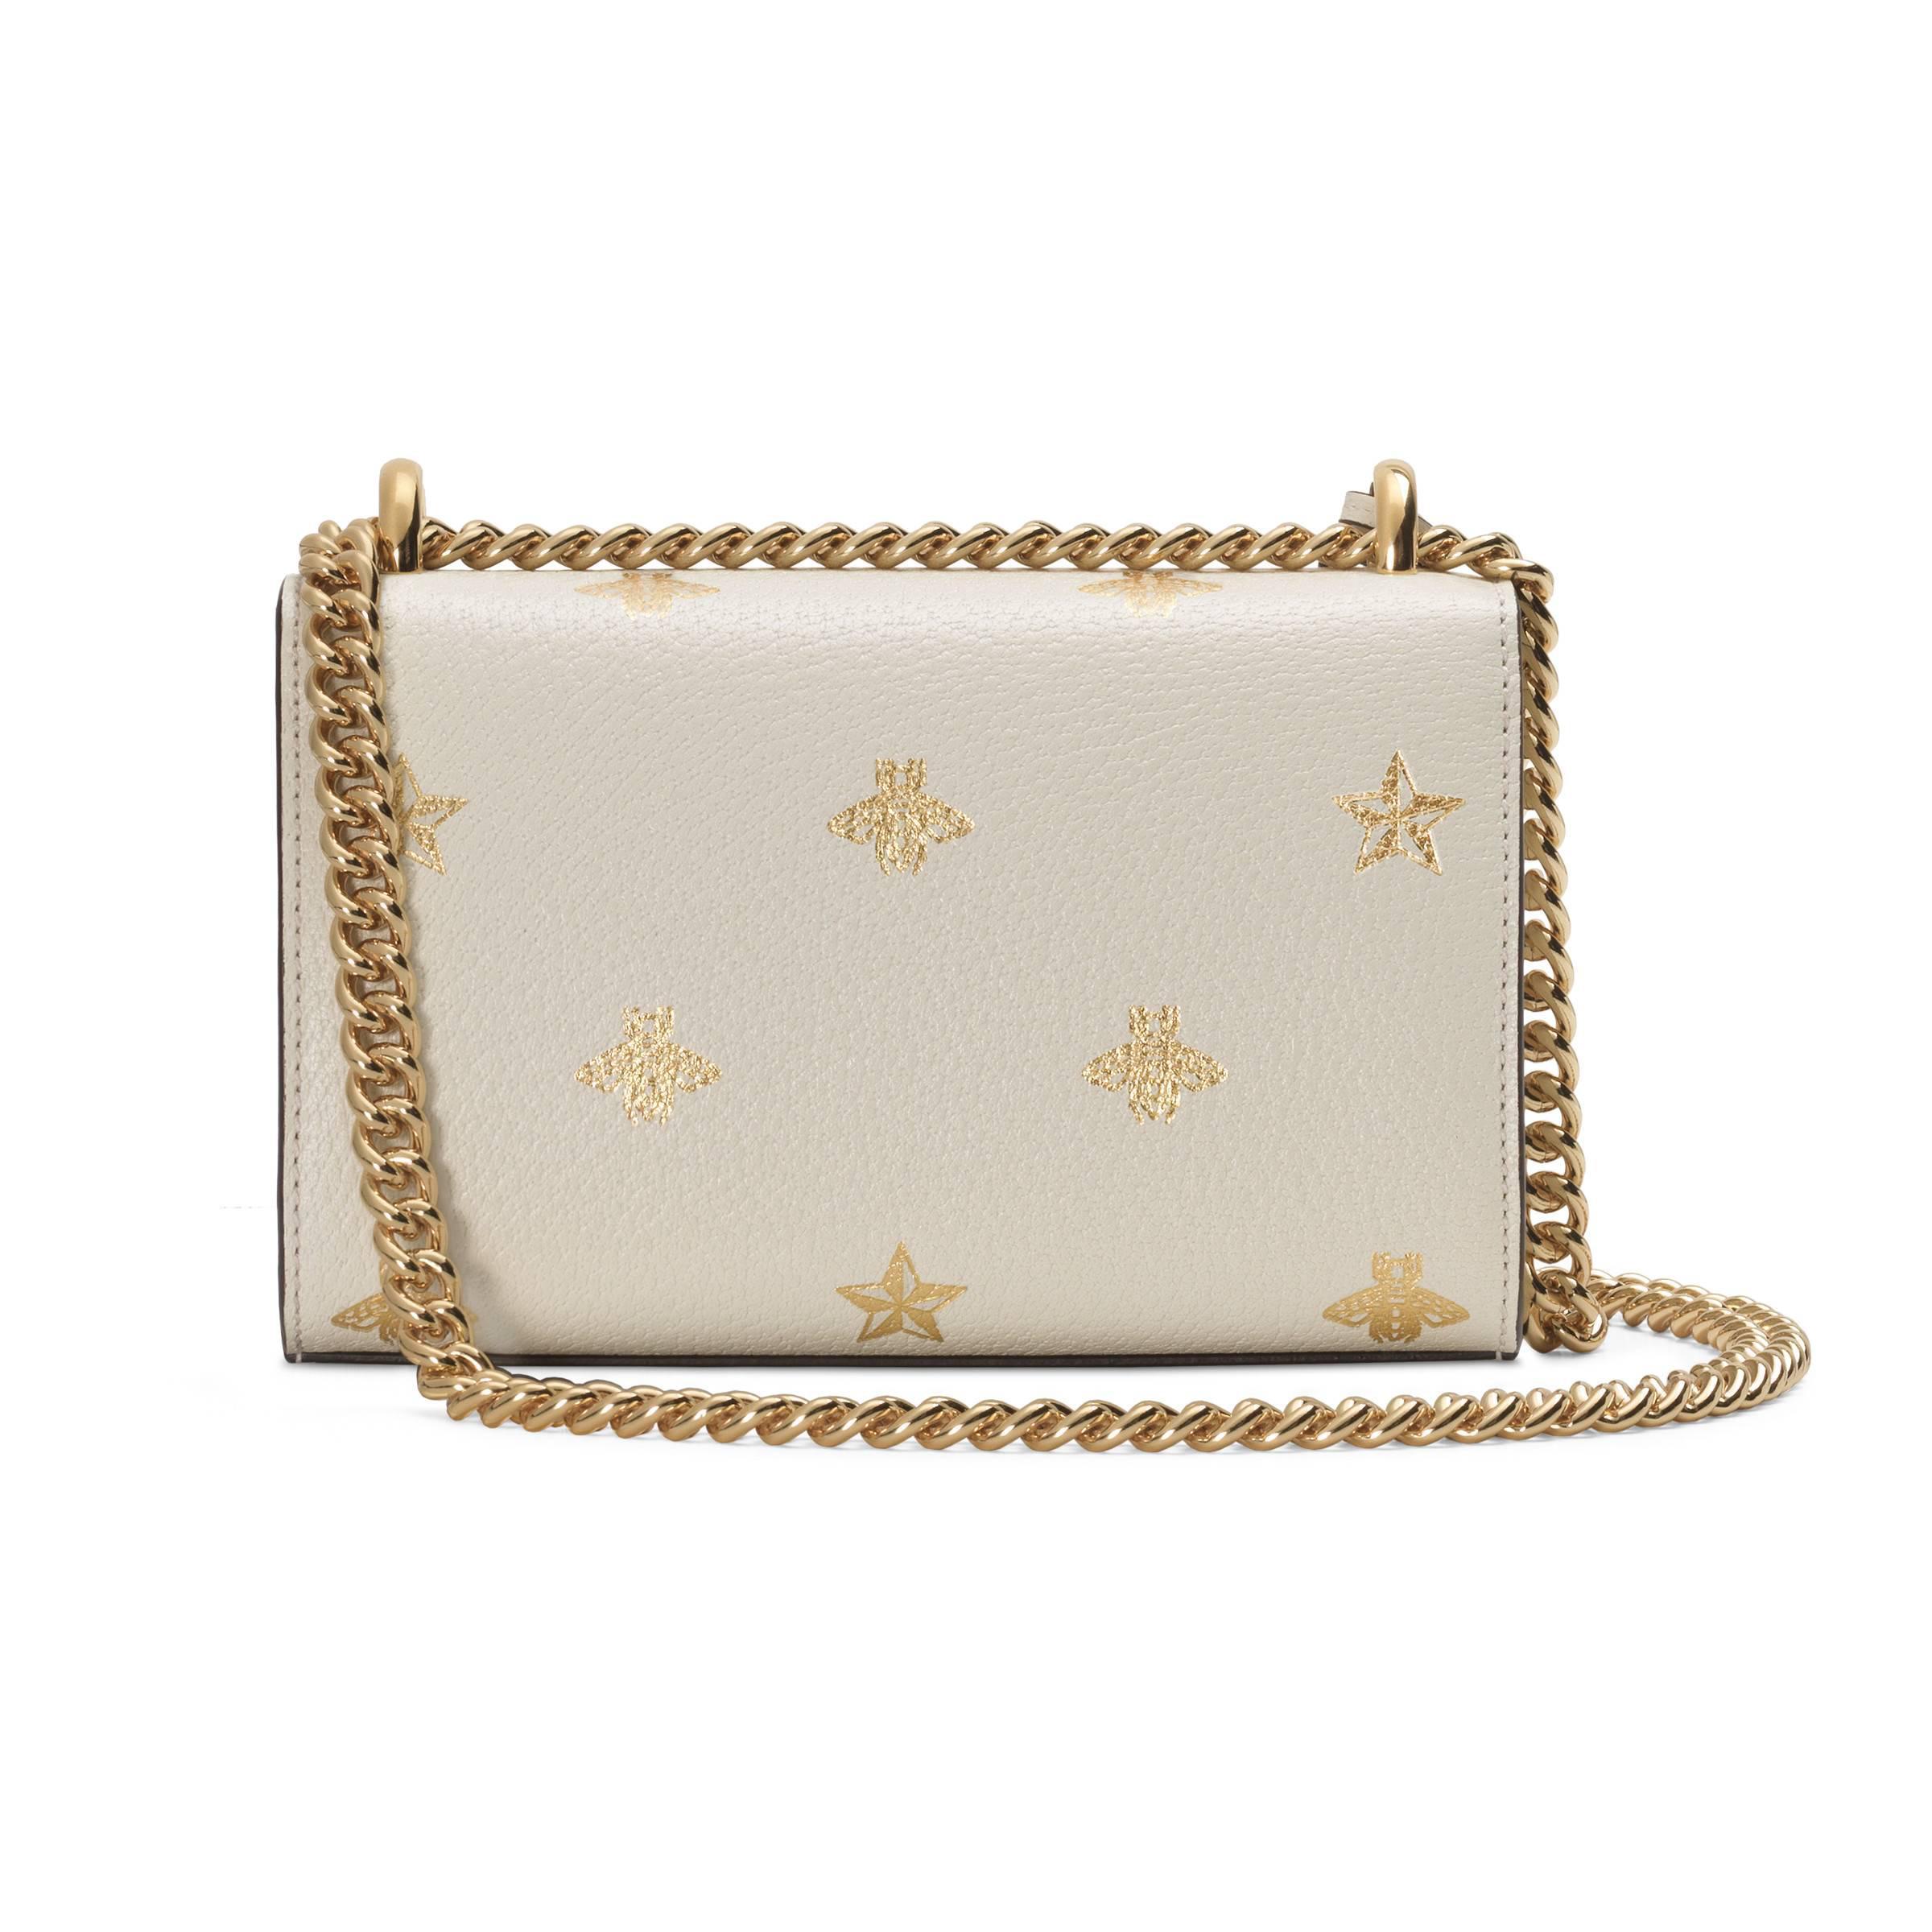 720822b9d88e Gucci - White Padlock Bee Star Small Shoulder Bag - Lyst. View fullscreen